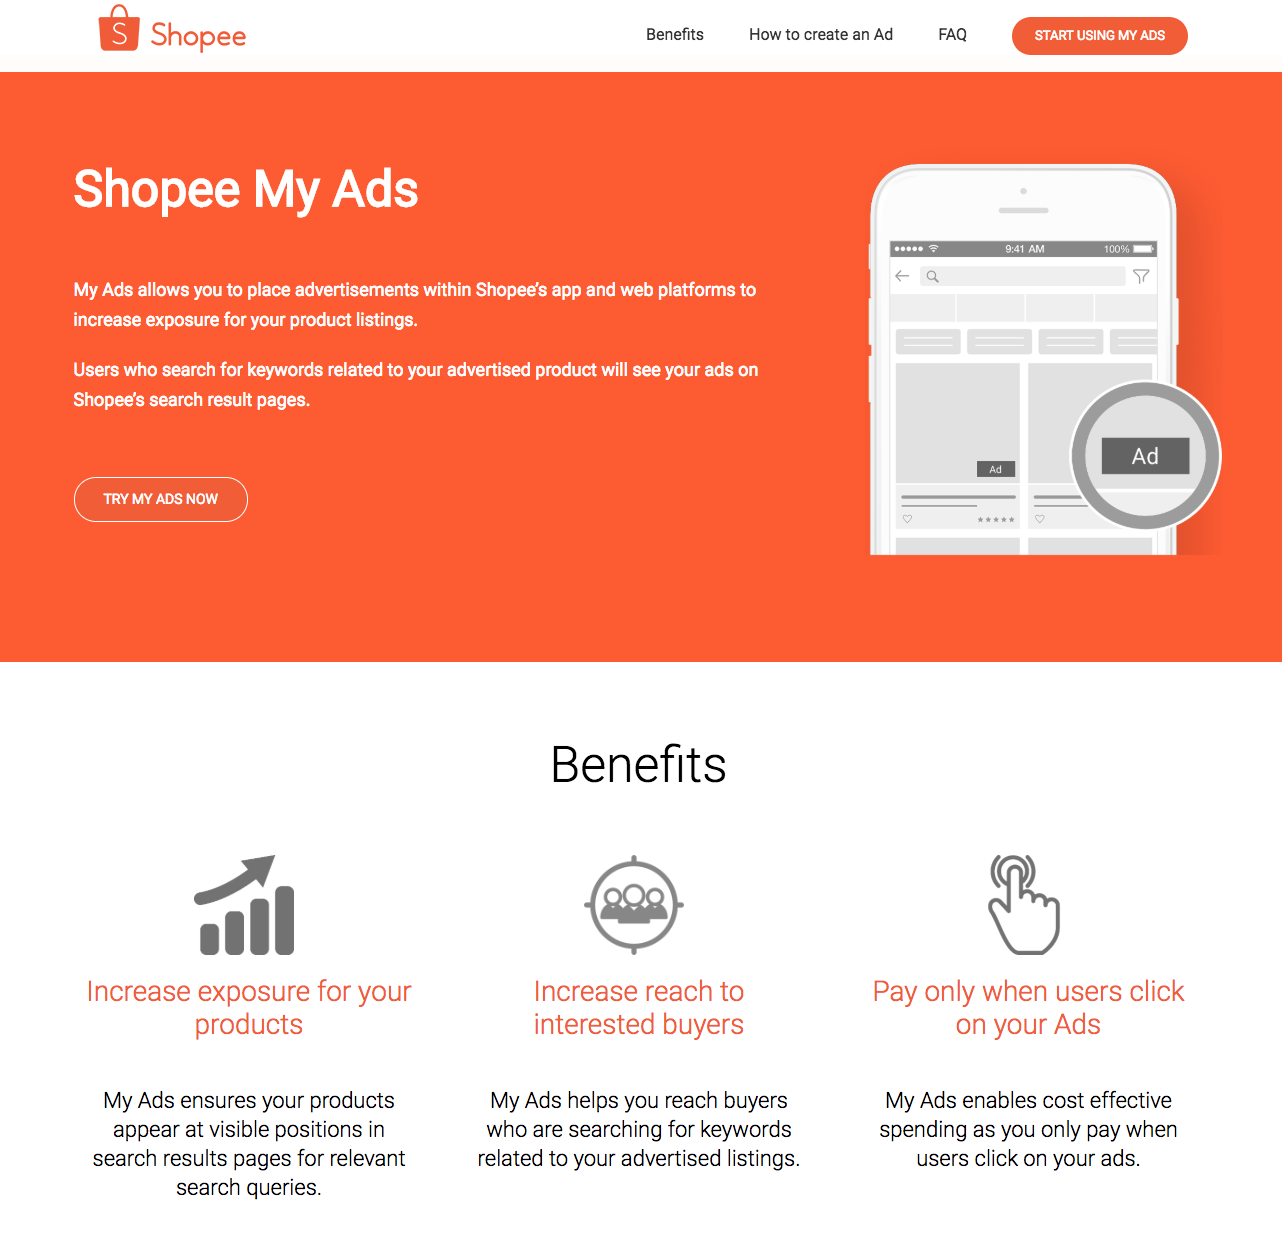 shopee-ads-benefits